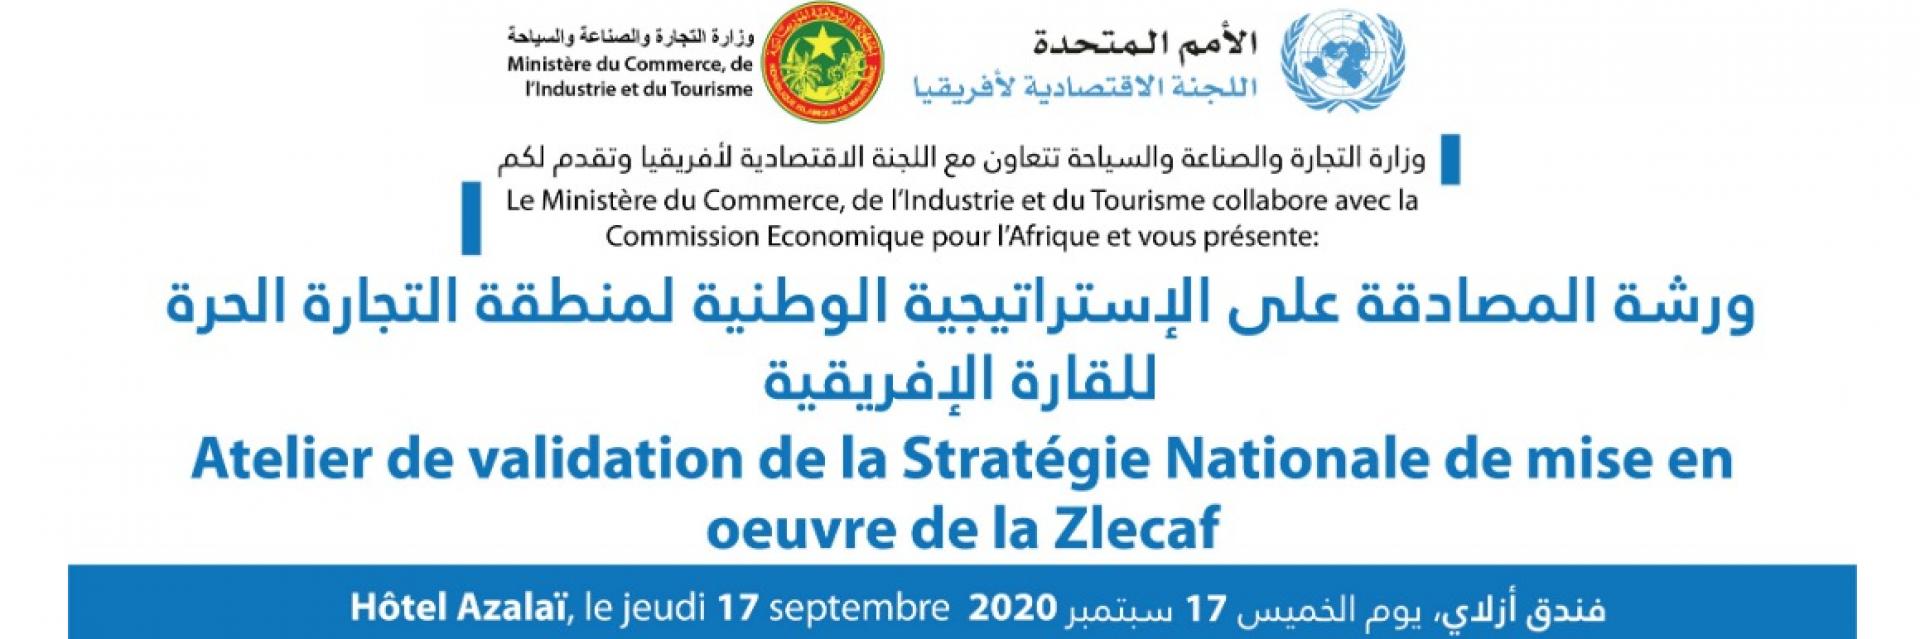 Mauritania finalizes AfCFTA implementation strategy